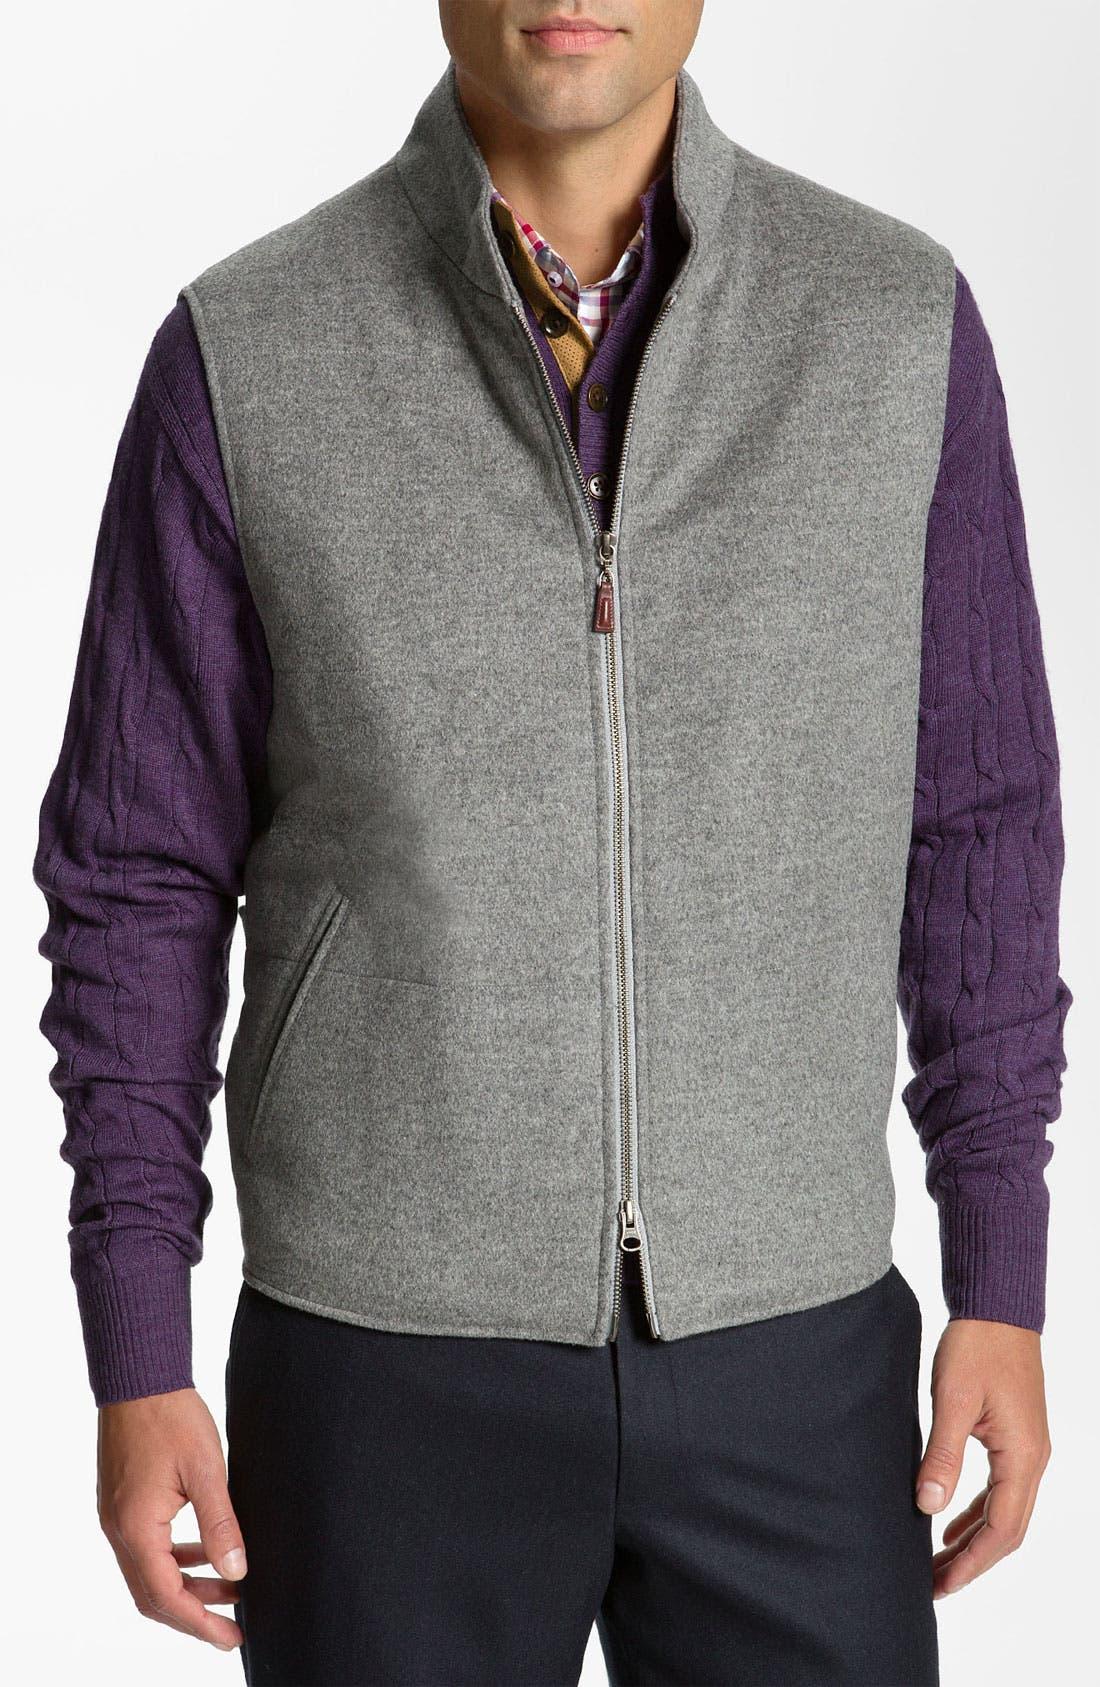 Alternate Image 1 Selected - Peter Millar Wool & Cashmere Vest